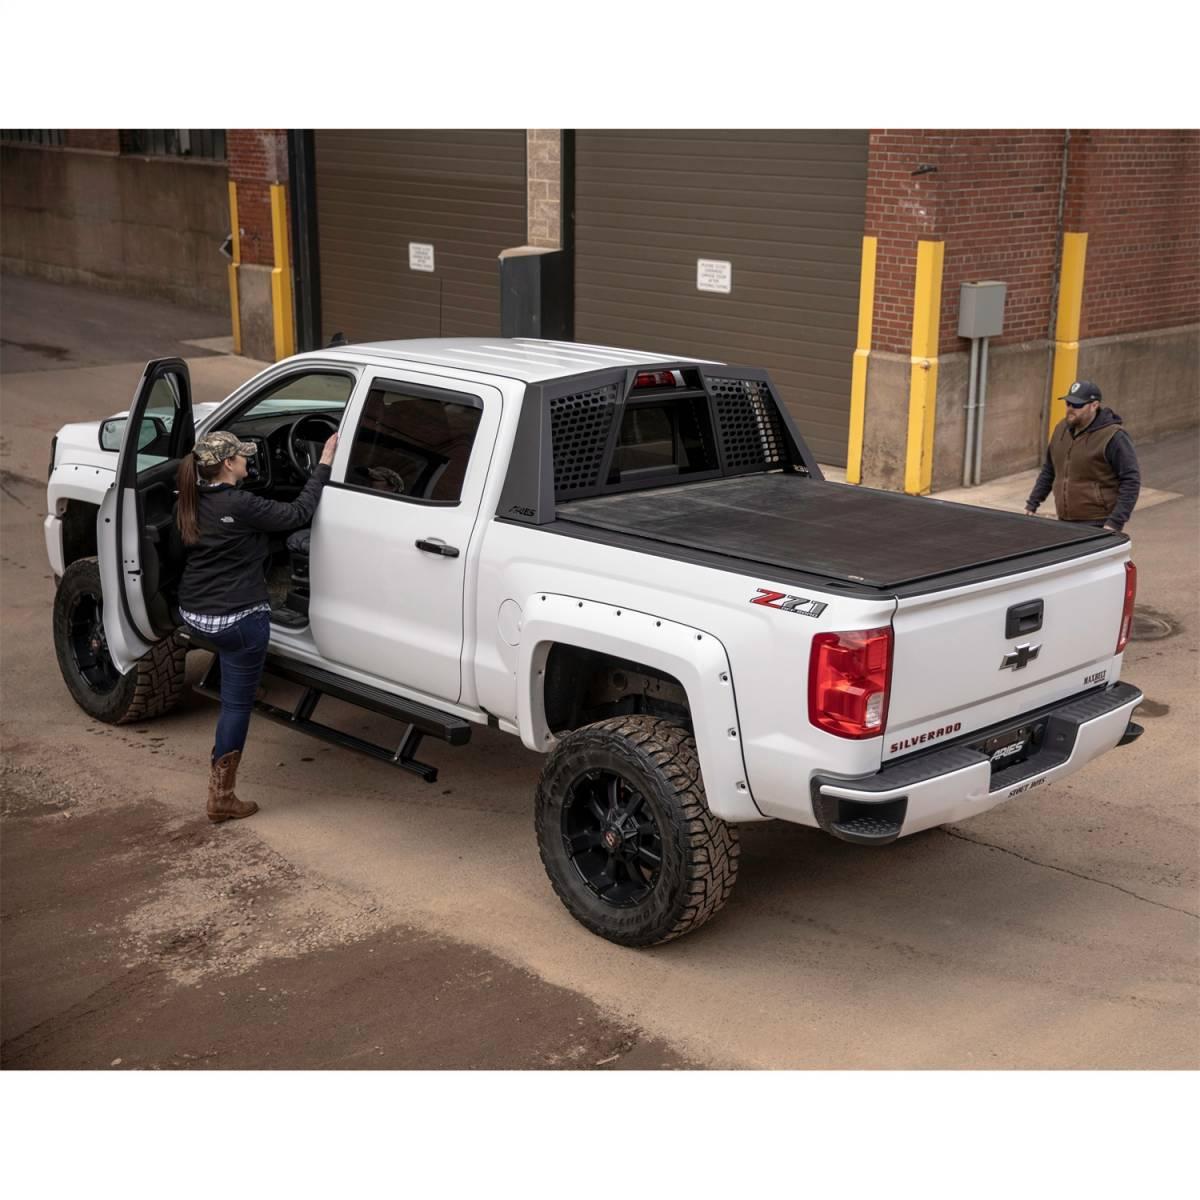 switchback headache rack aries 1110110 nelson truck equipment and accessories